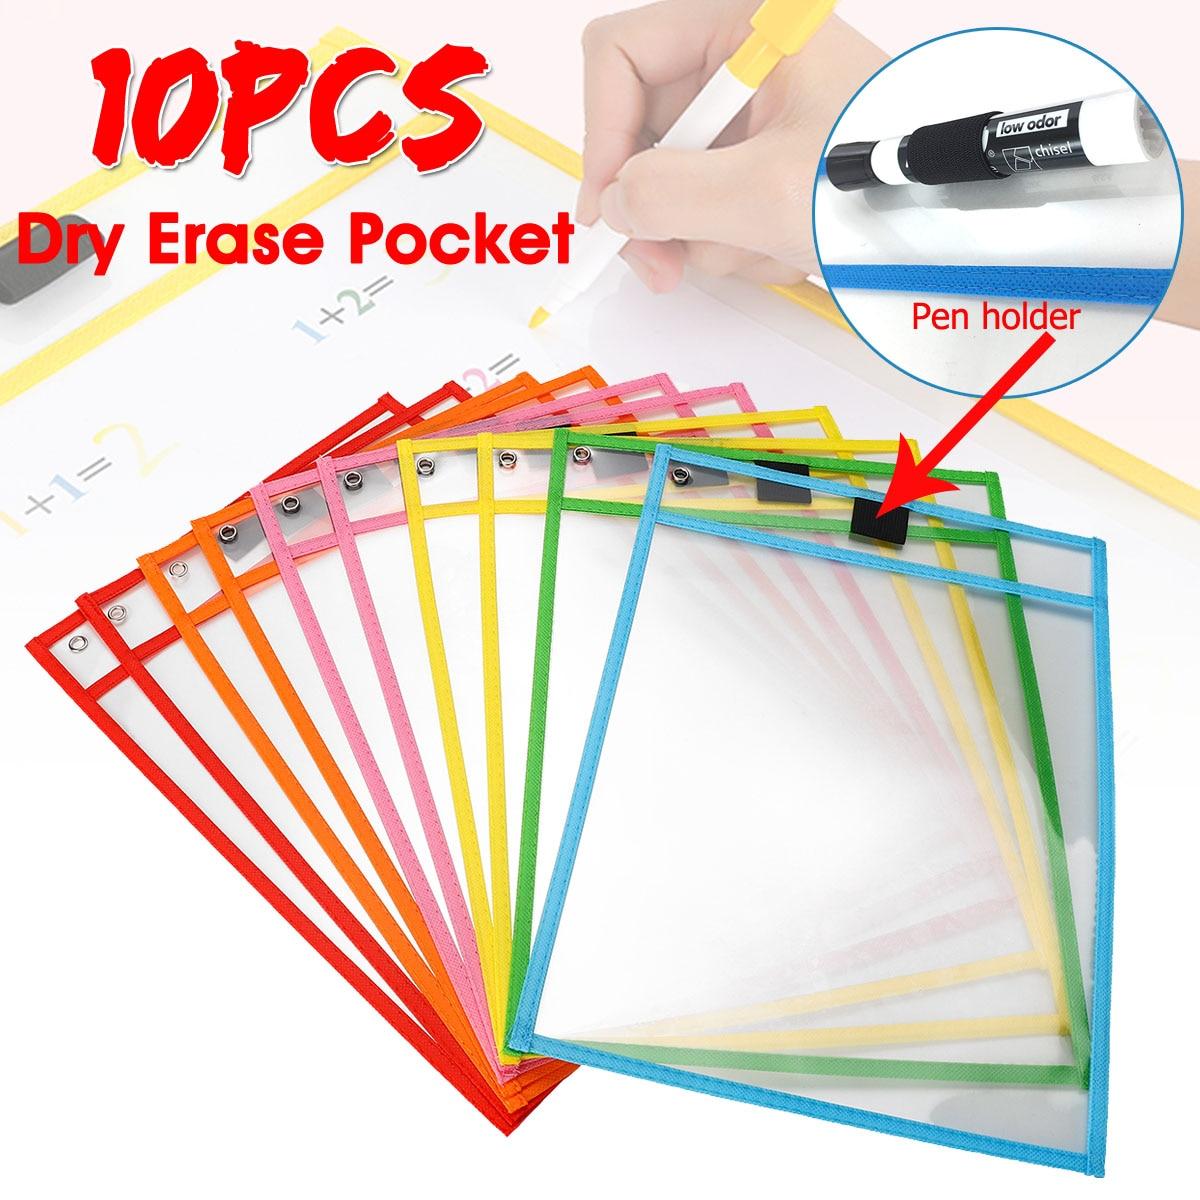 10Pcs Write And Wipe Reusable  Pocket Classroom Organization Environmental Protection Students Kids Tools School Kits